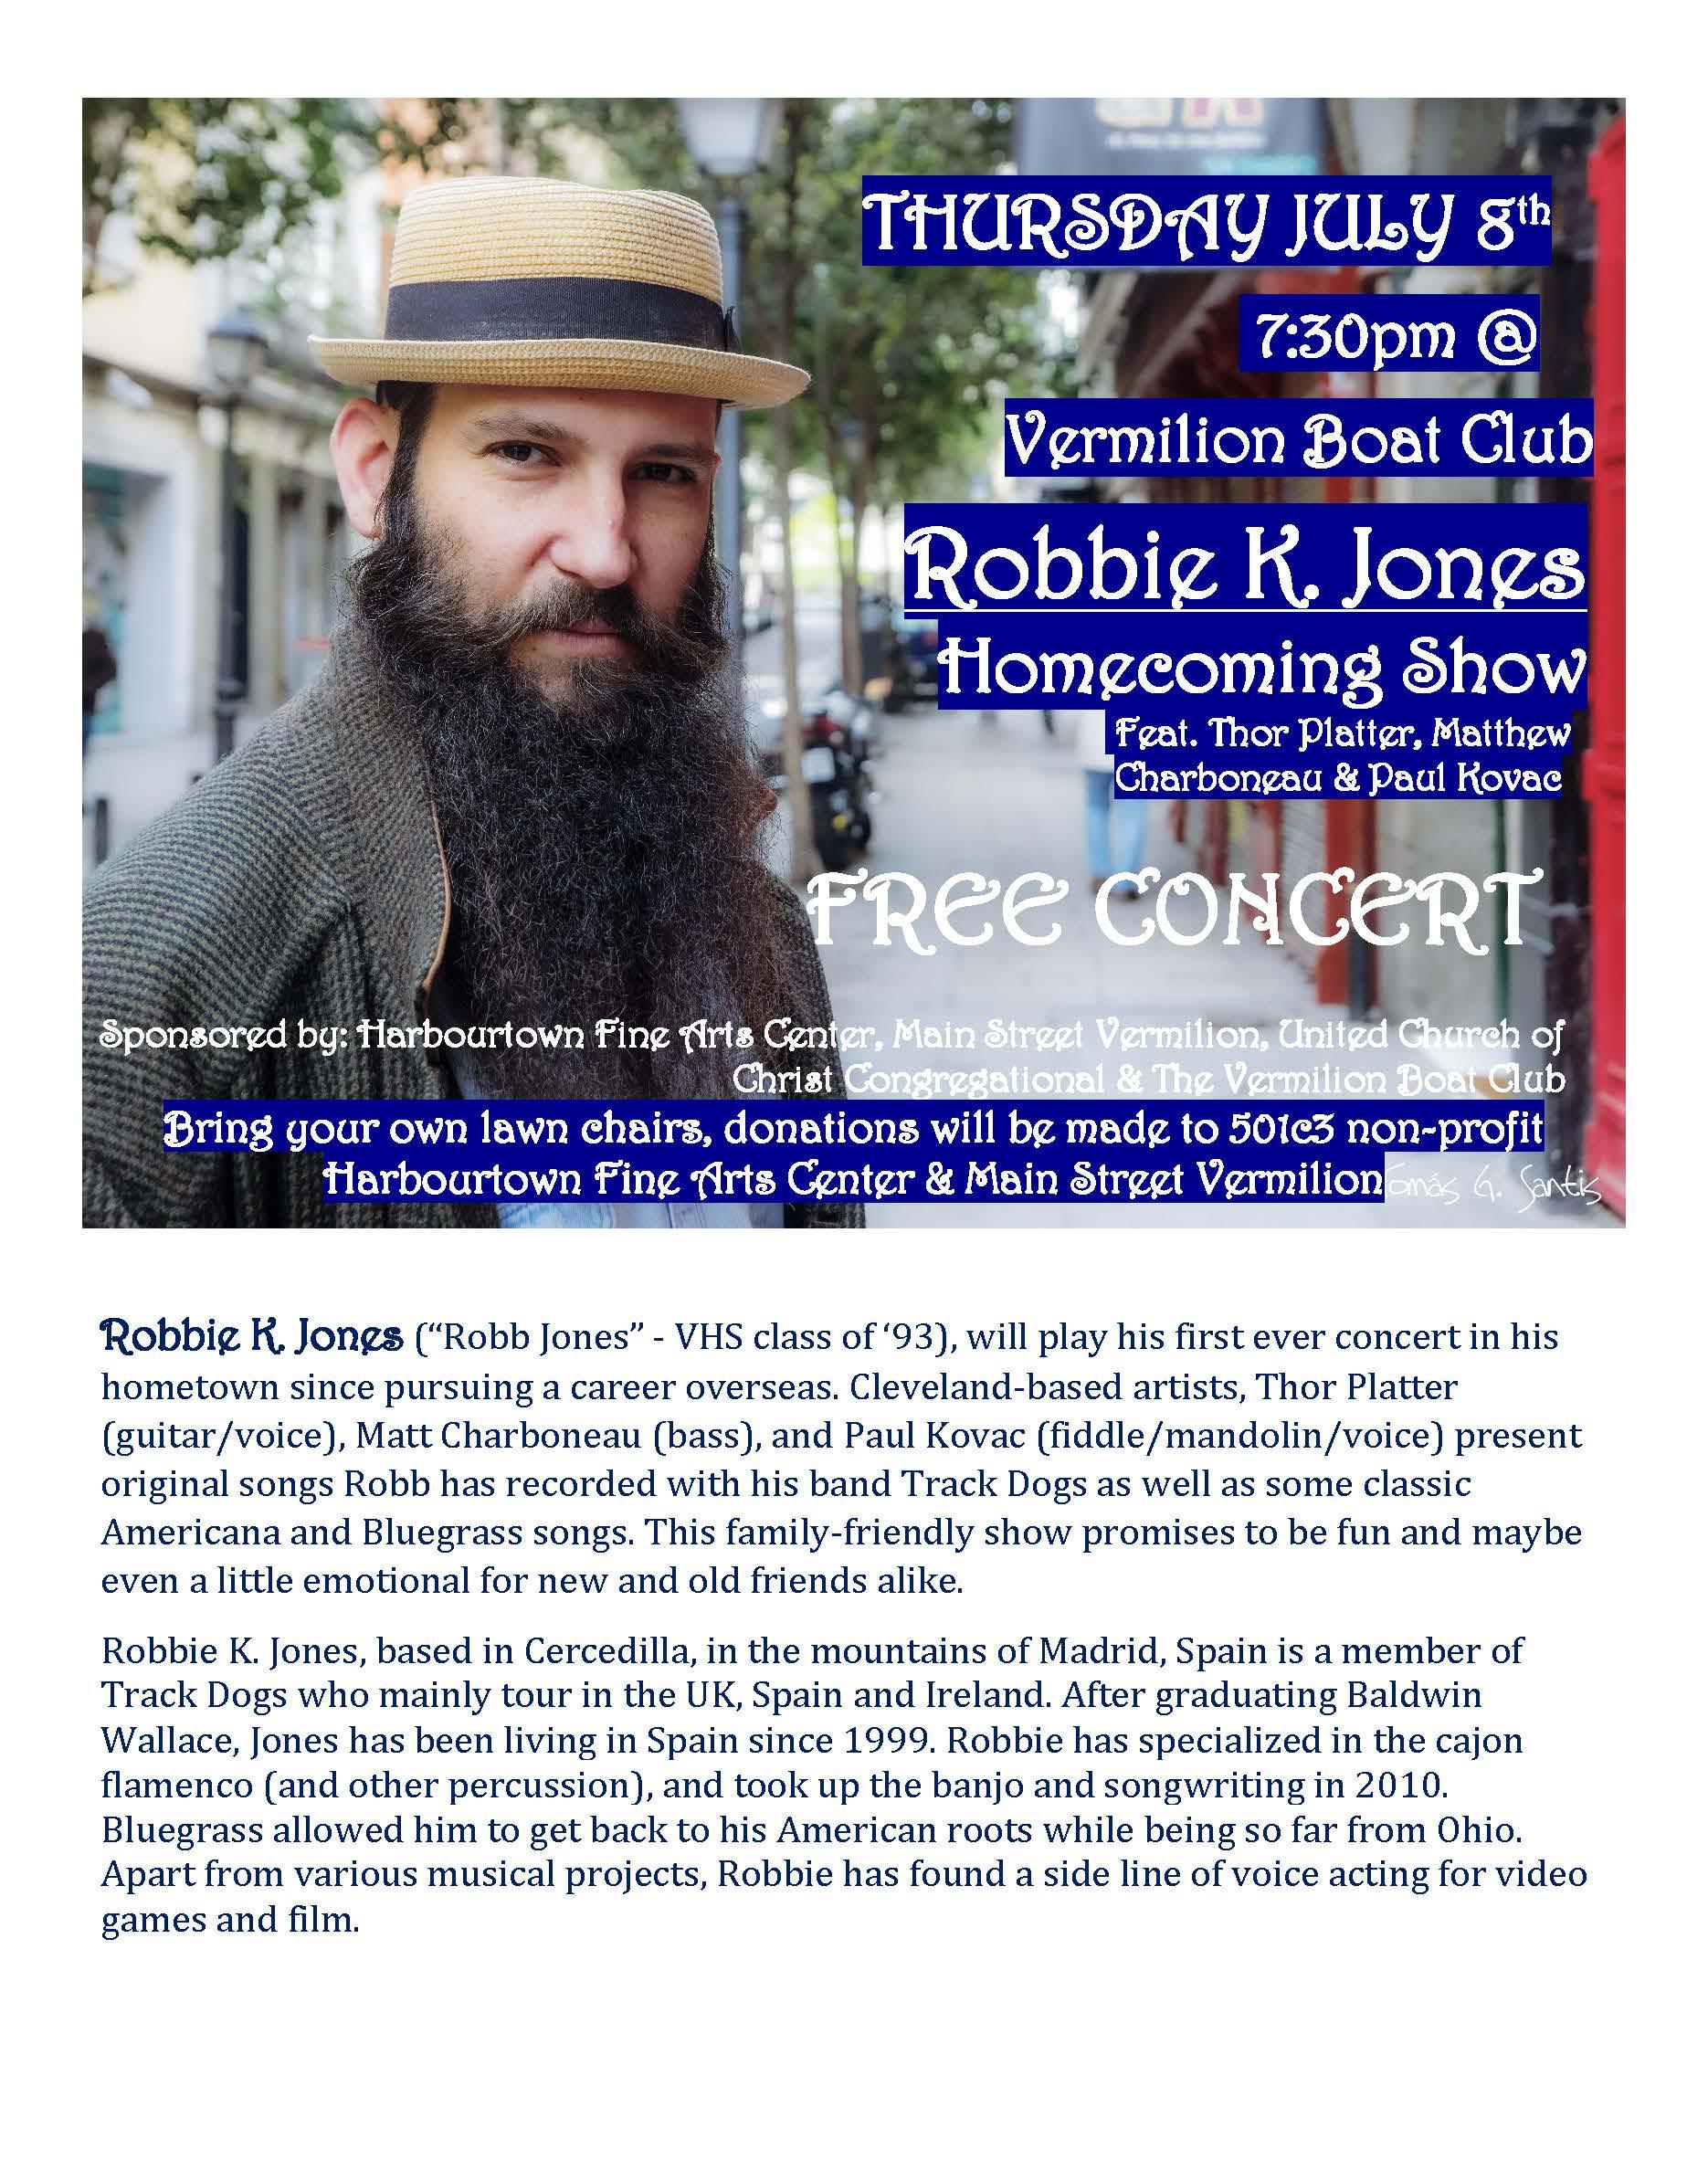 Robbie K Jones THURSDAY JULY 8th, 2021 website